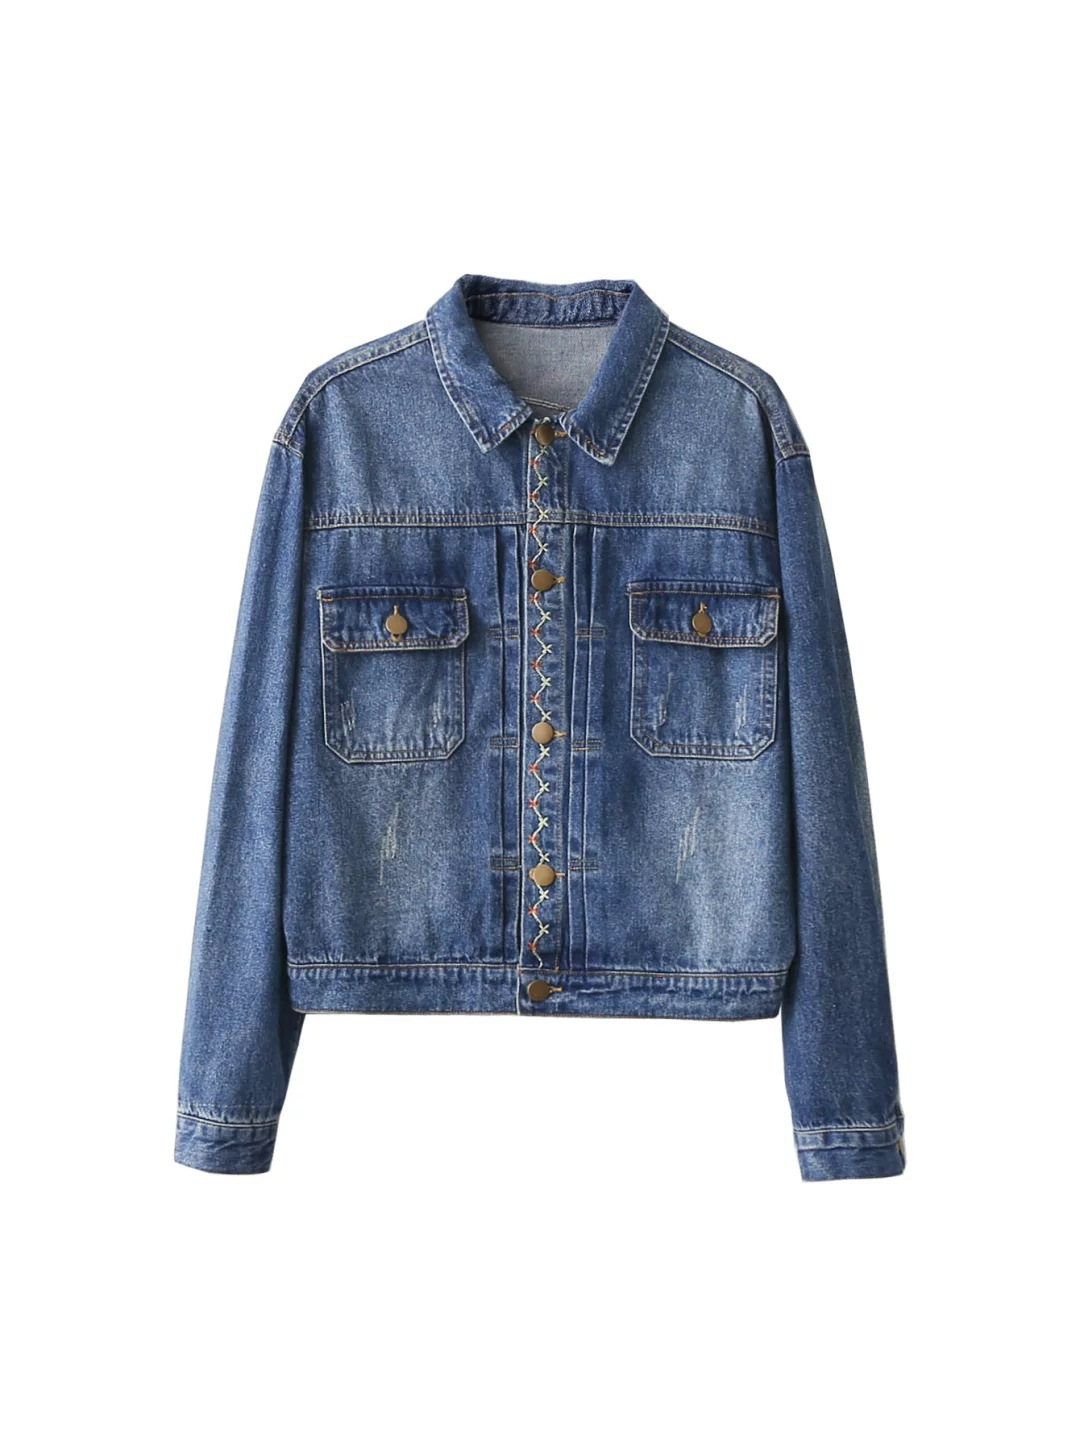 Plum Spring Autumn European Denim And Coat Women's Embroidered Fashion Wild Jacket New 0Ofwfnx1